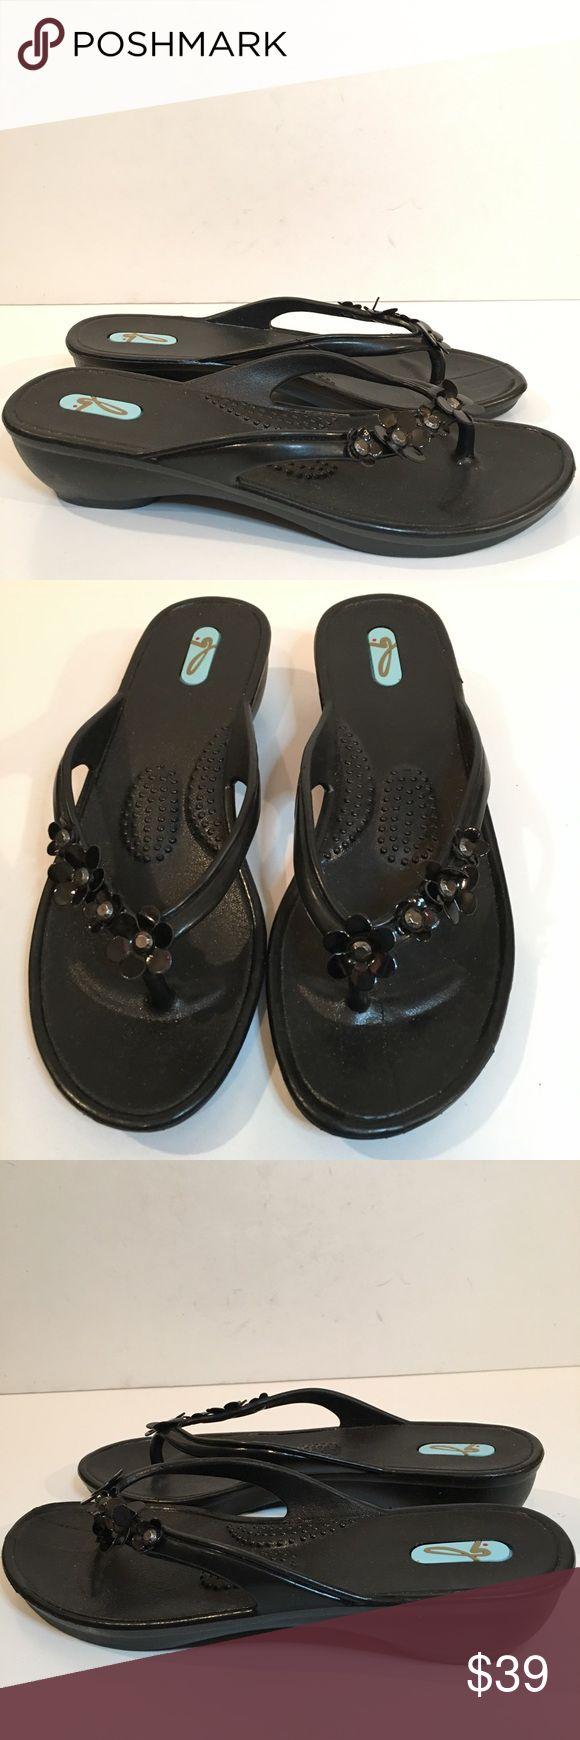 New Oka B Sandles Size M 7-8 Floral Flip Flops. #shopmycloset #poshmark #fashion #shopping #style #forsale #OKA b. #Shoes